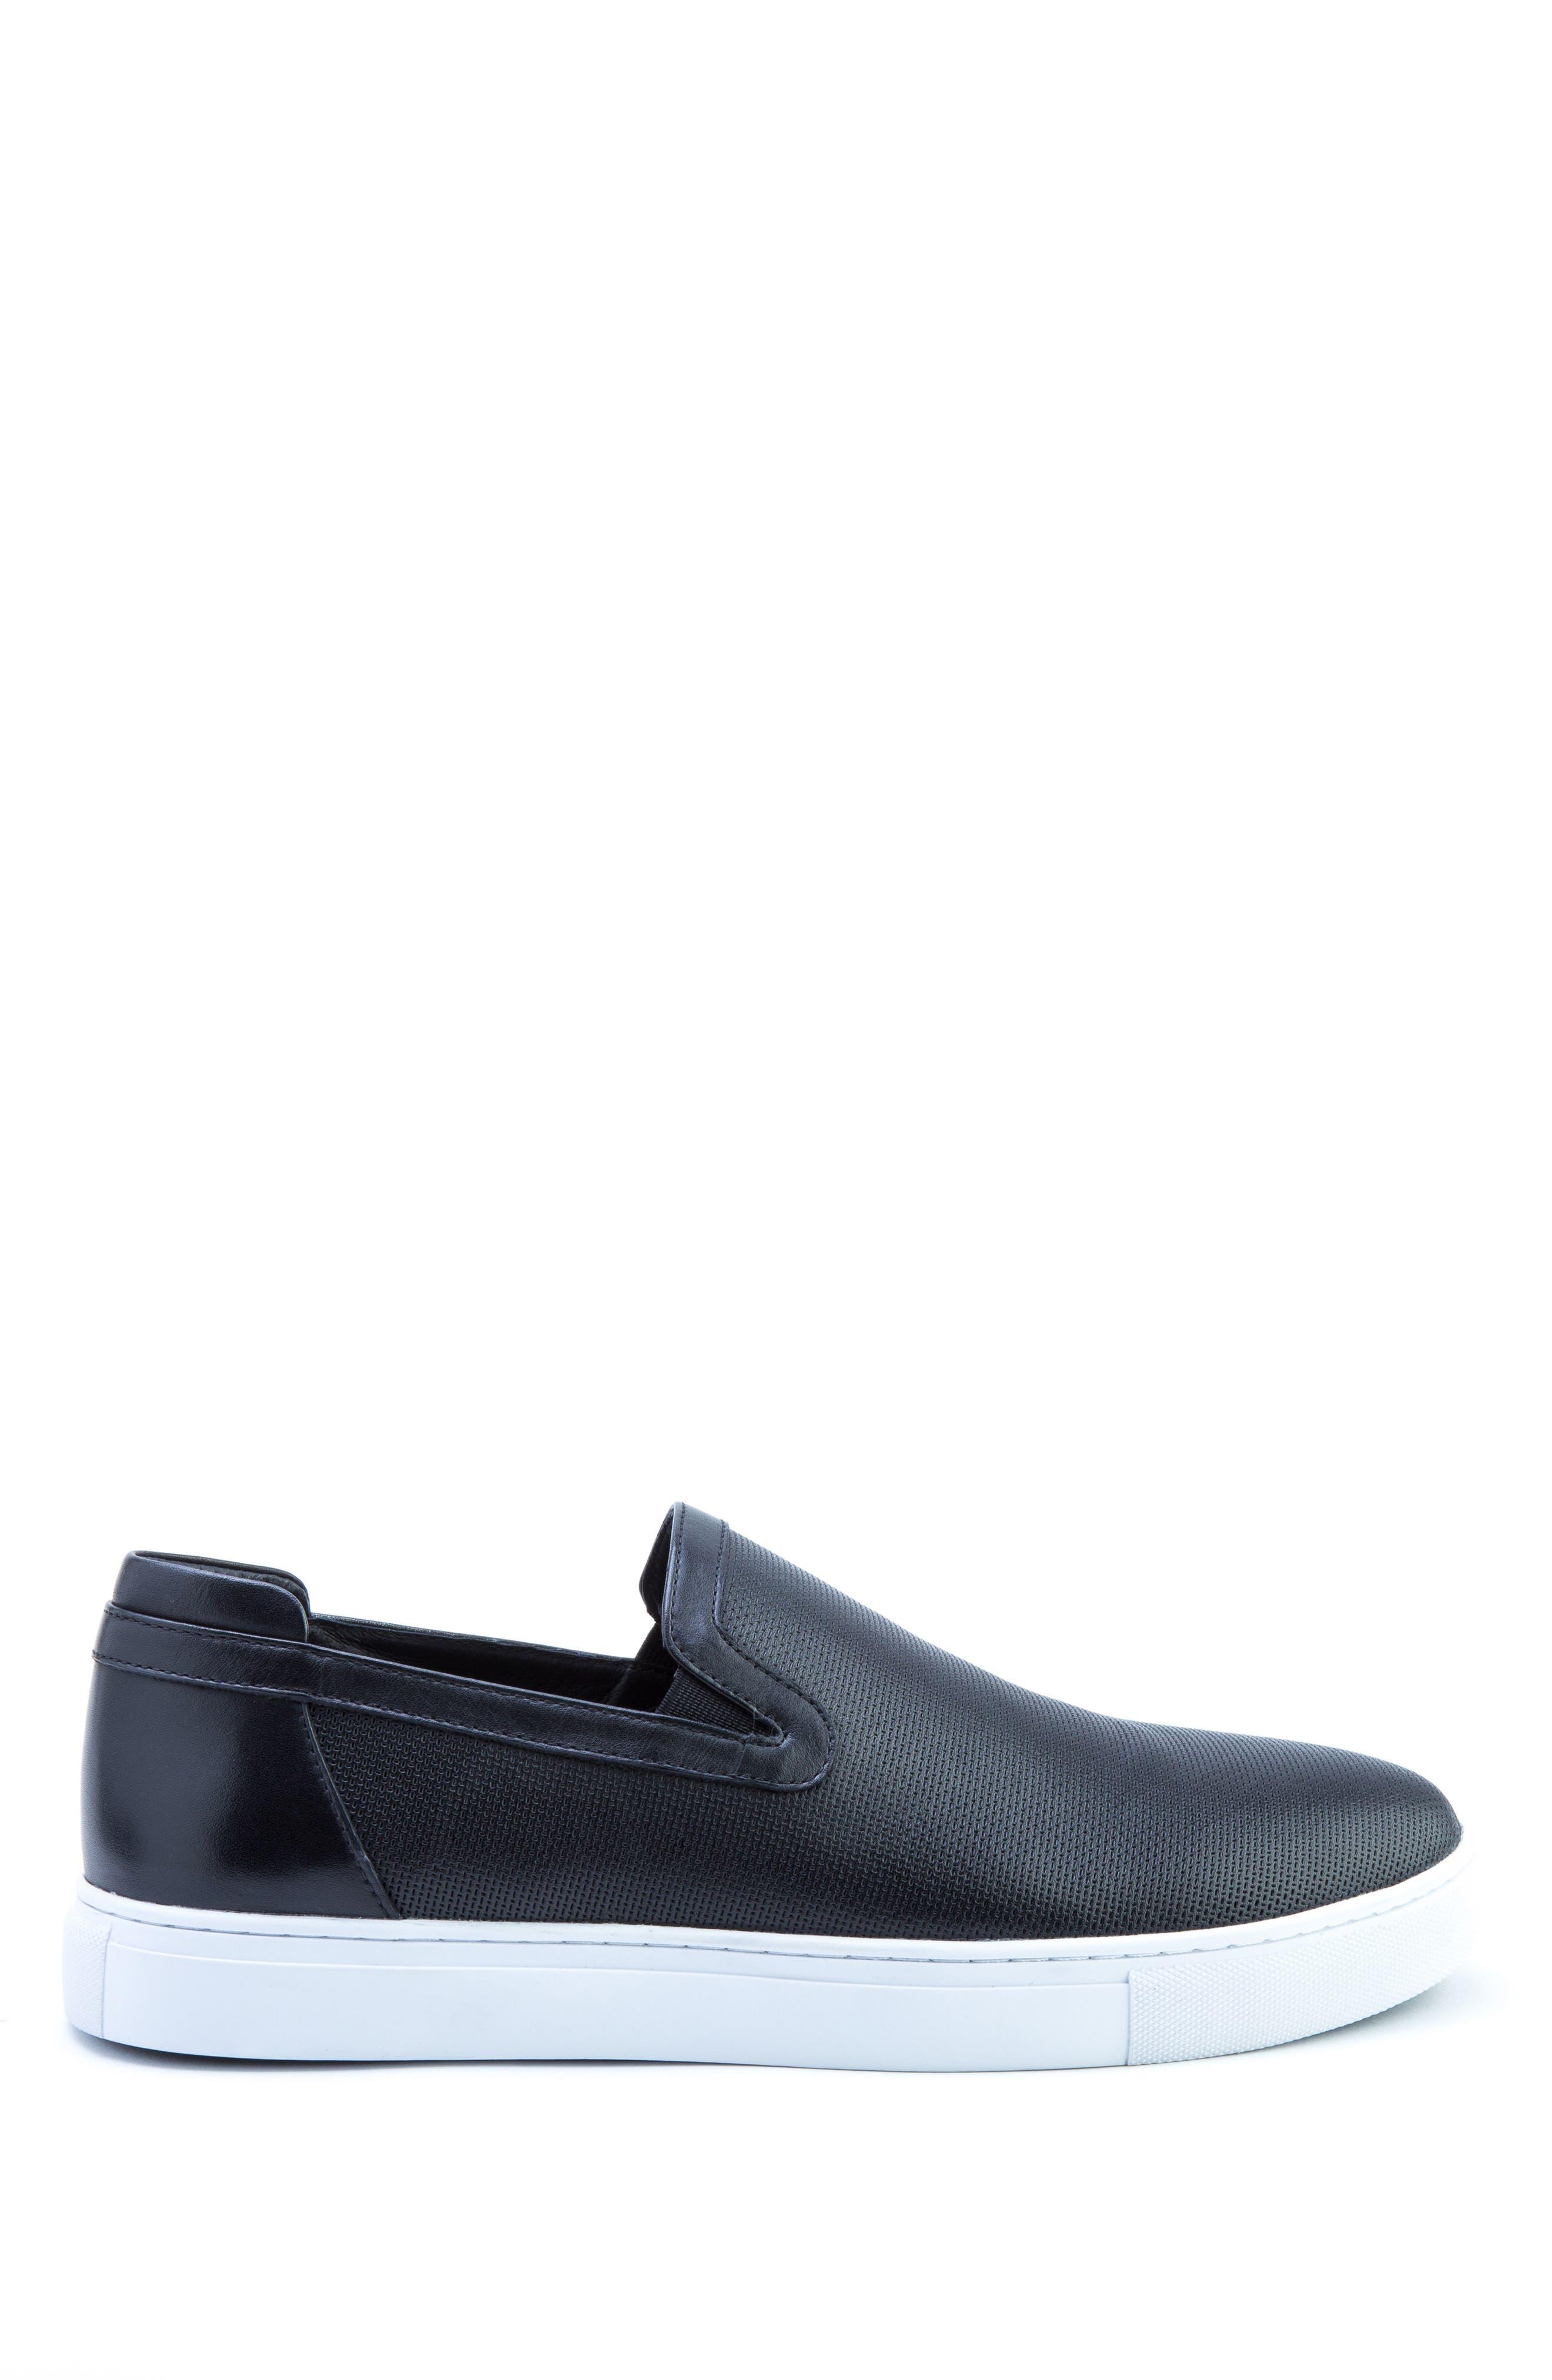 Grant Sneaker,                             Alternate thumbnail 3, color,                             BLACK LEATHER